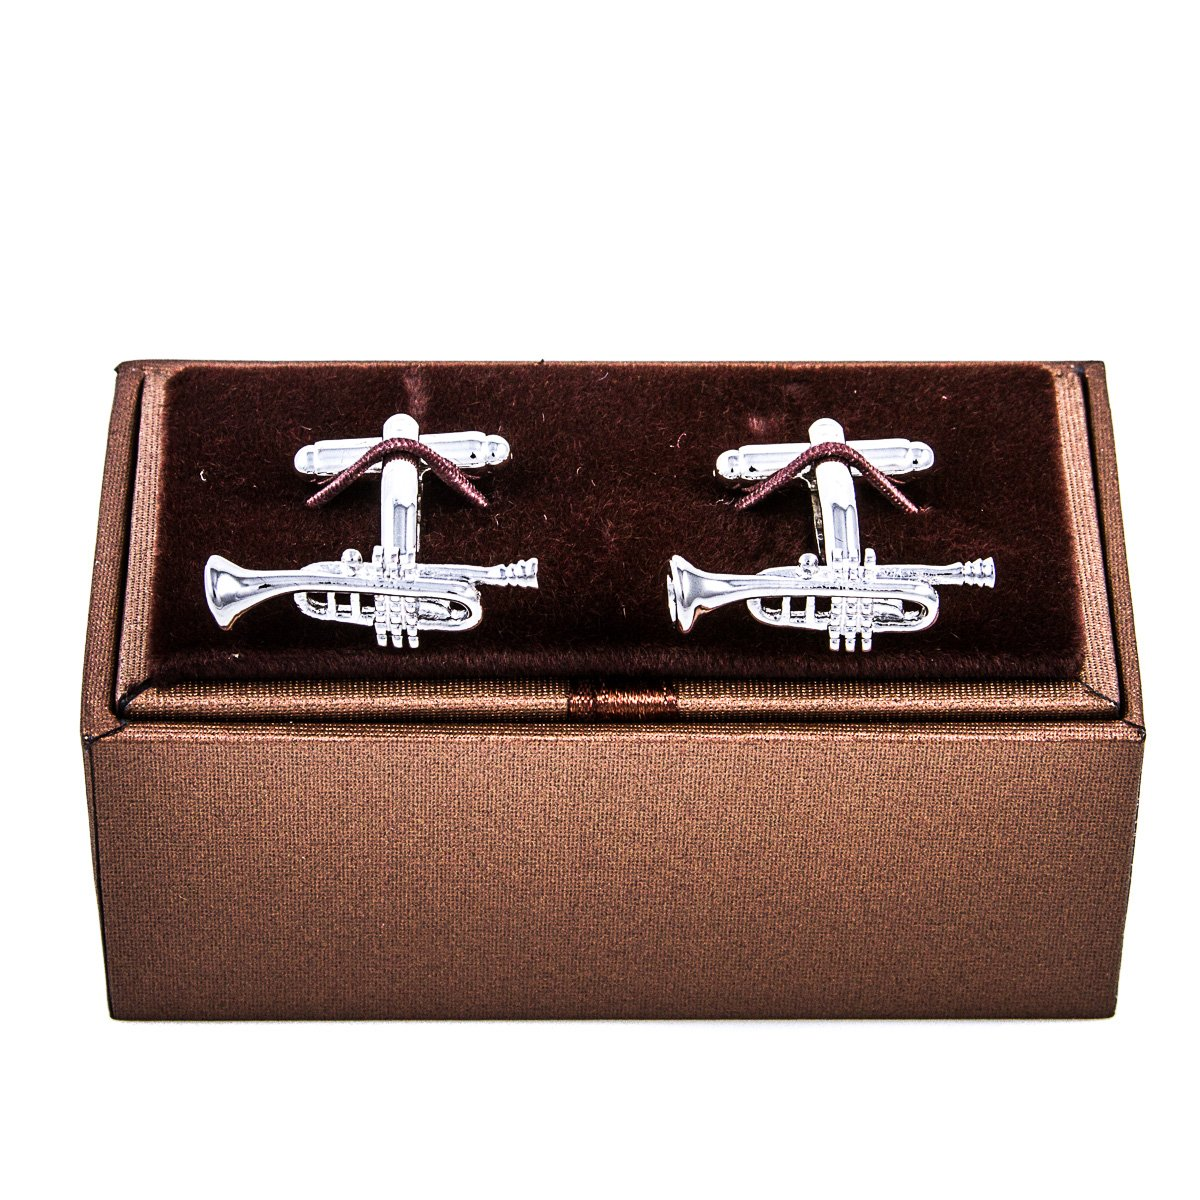 MRCUFF Trumpet Jazz Music Pair Cufflinks in a Presentation Gift Box & Polishing Cloth MRCUFF1690